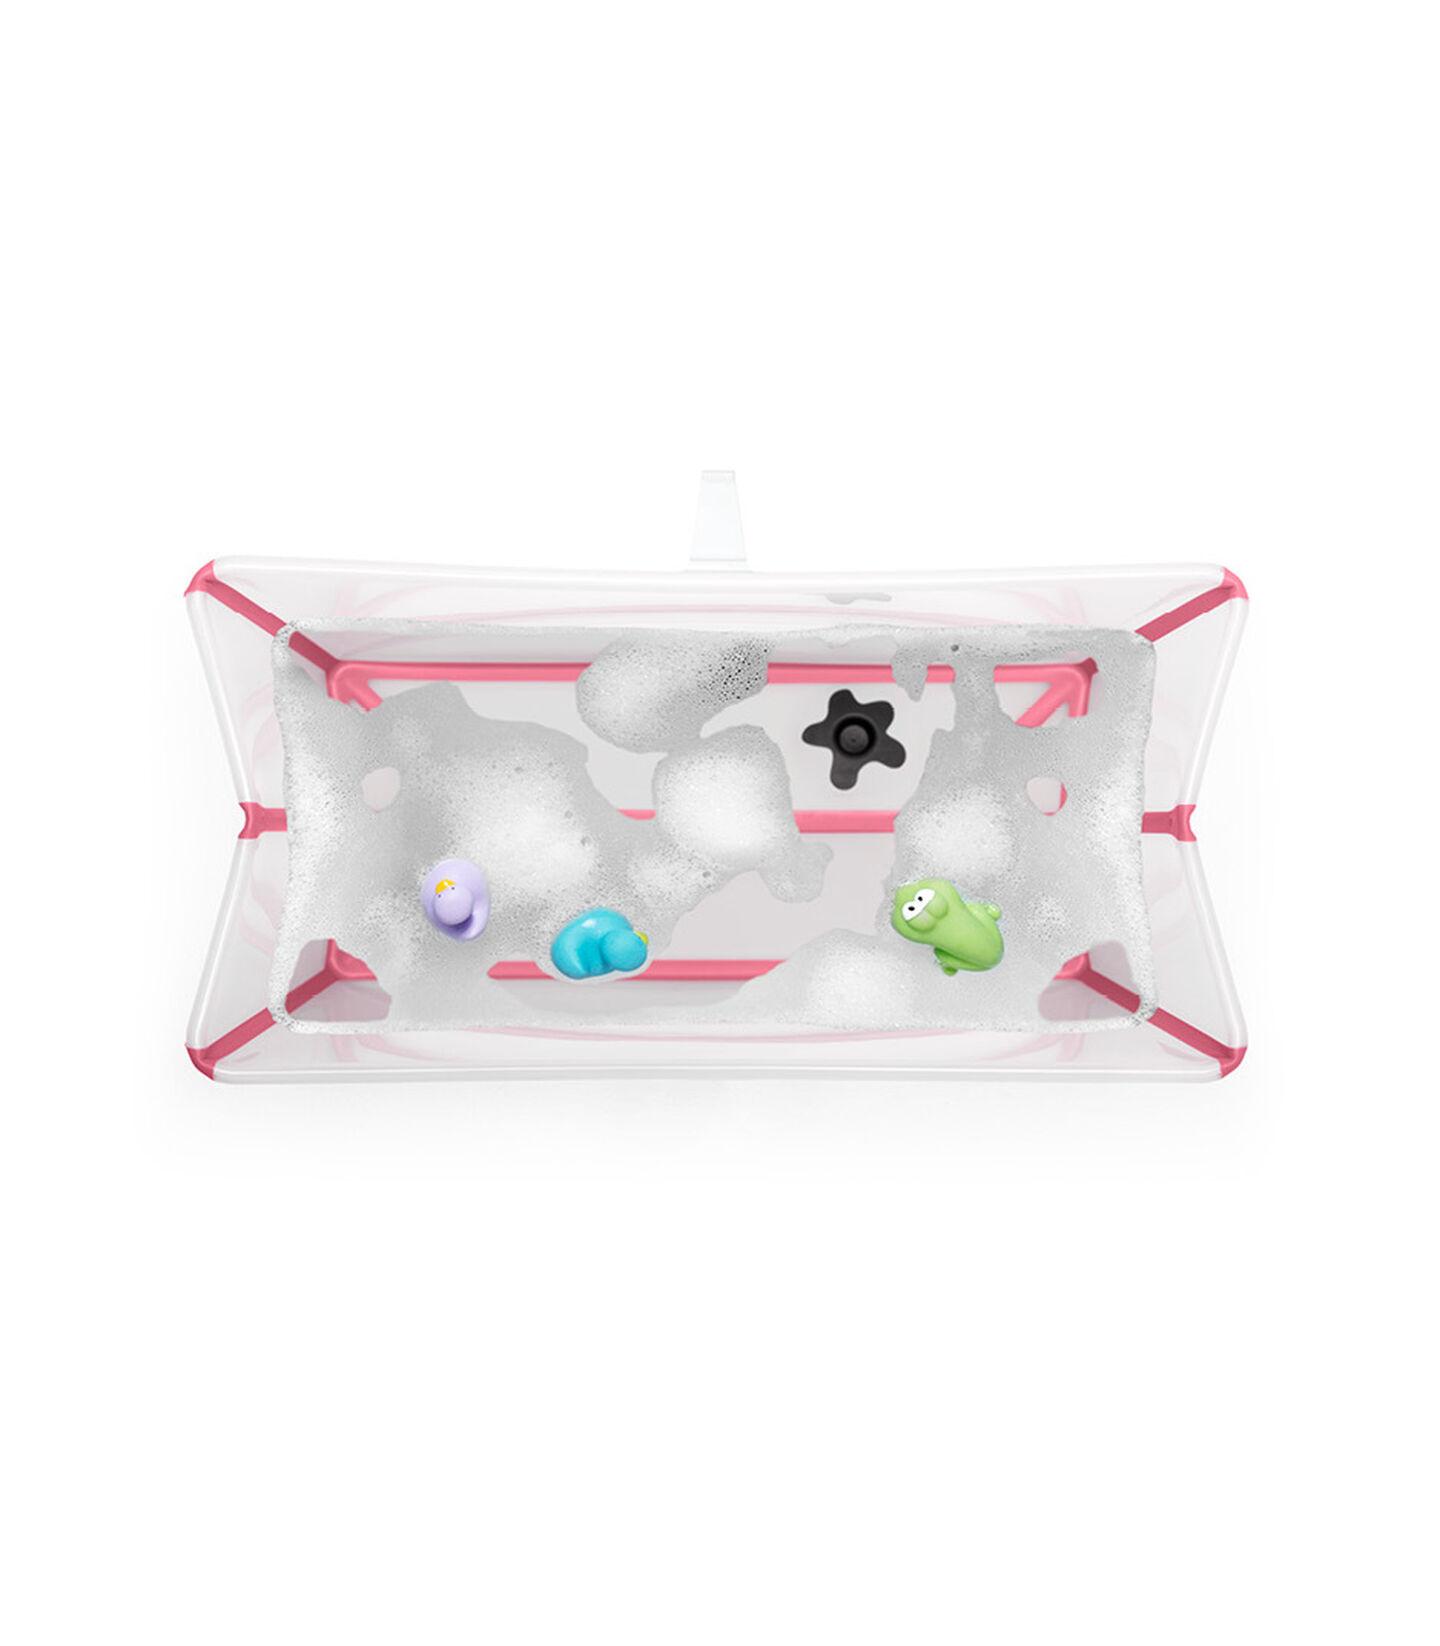 Stokke® Flexi Bath® bath tub, Transparent Pink. Open.